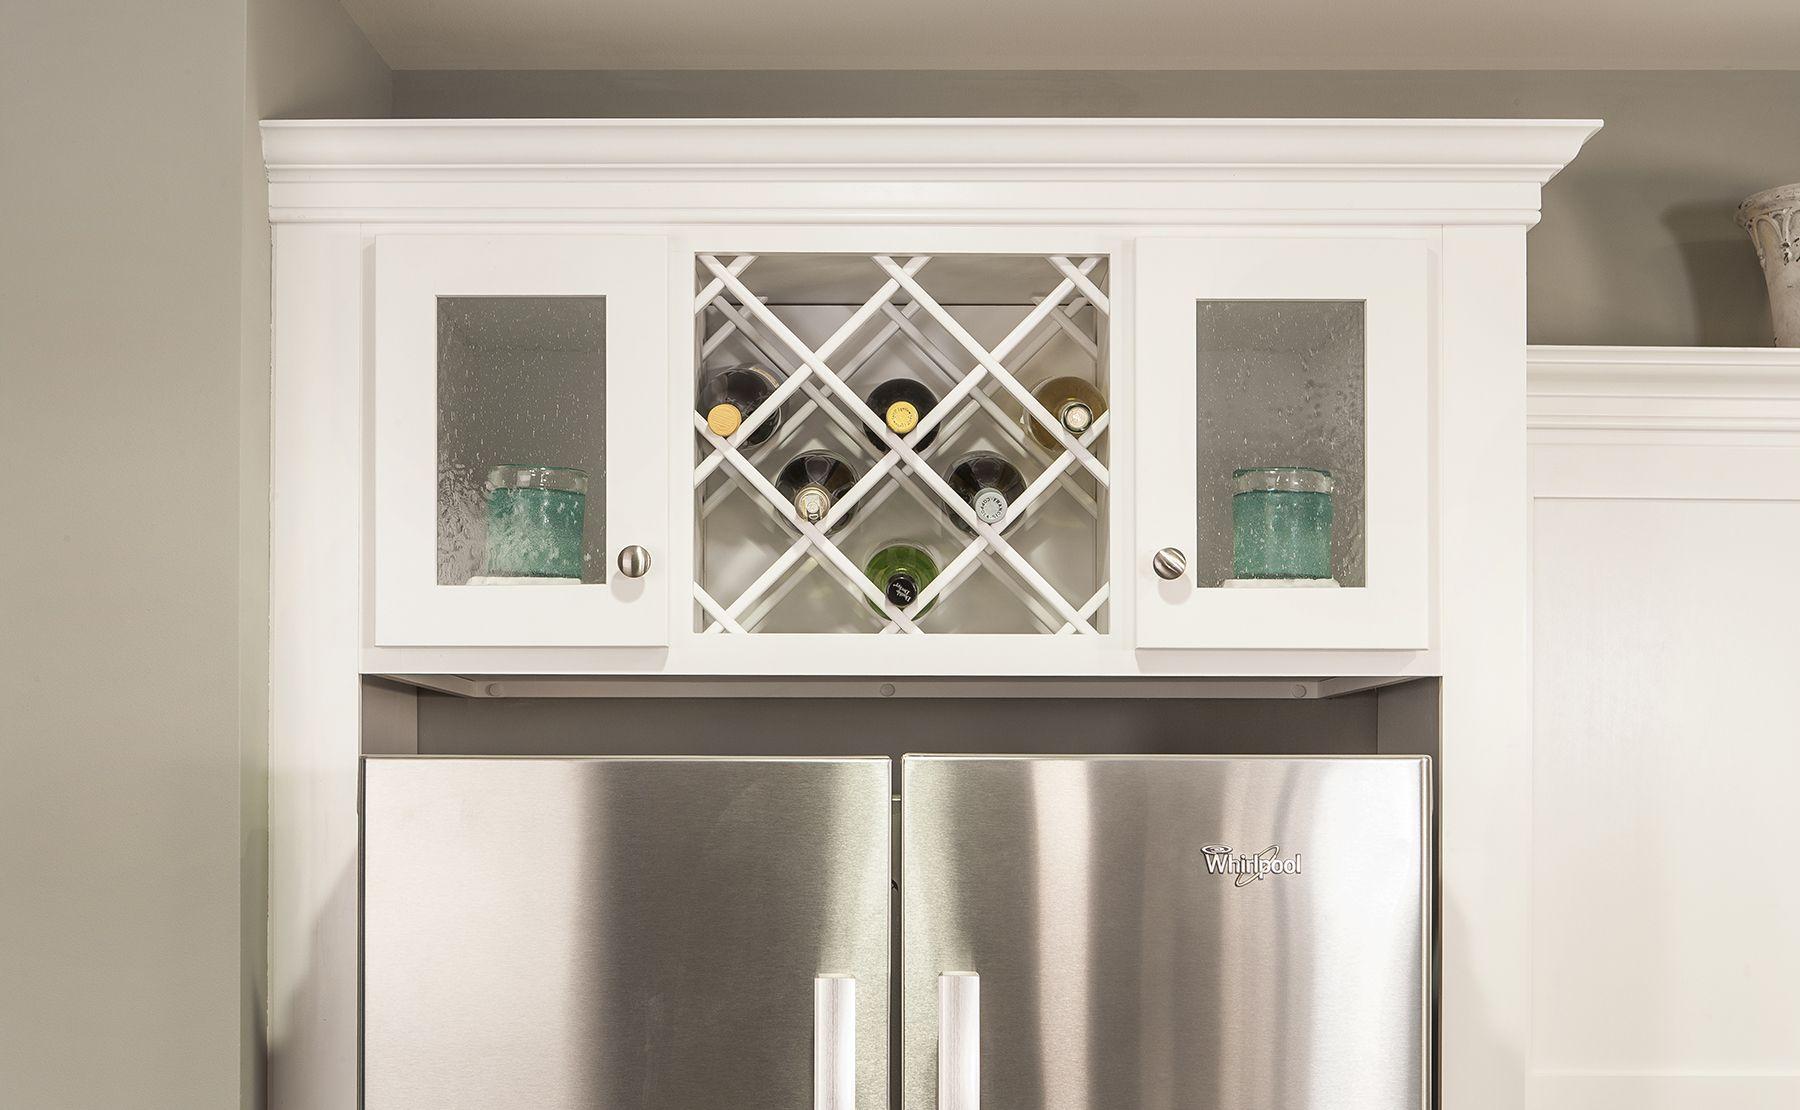 We Ve Got The Fridge Surrounded Kitchen Diy Makeover Diy Kitchen Renovation Diy Kitchen Cabinets